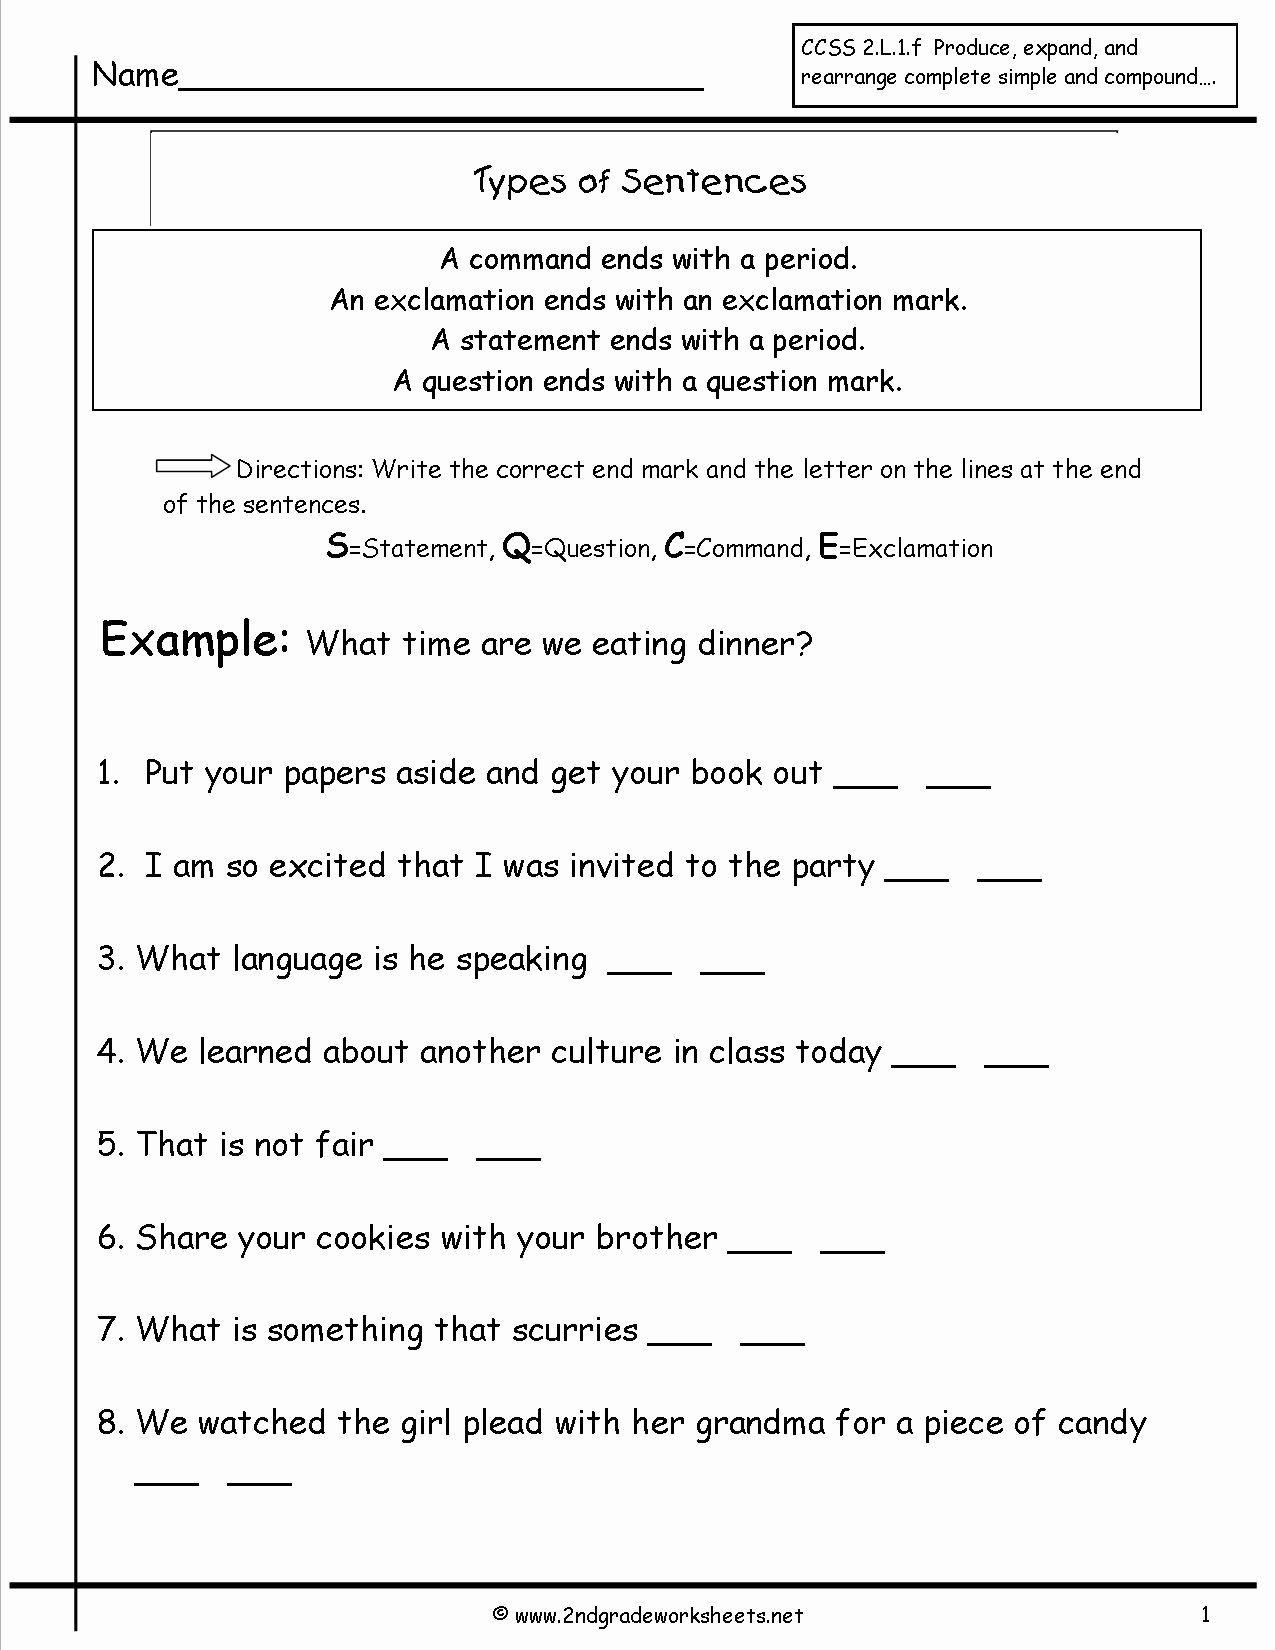 Declarative Sentence Worksheets   Printable Worksheets and Activities for  Teachers [ 1650 x 1275 Pixel ]